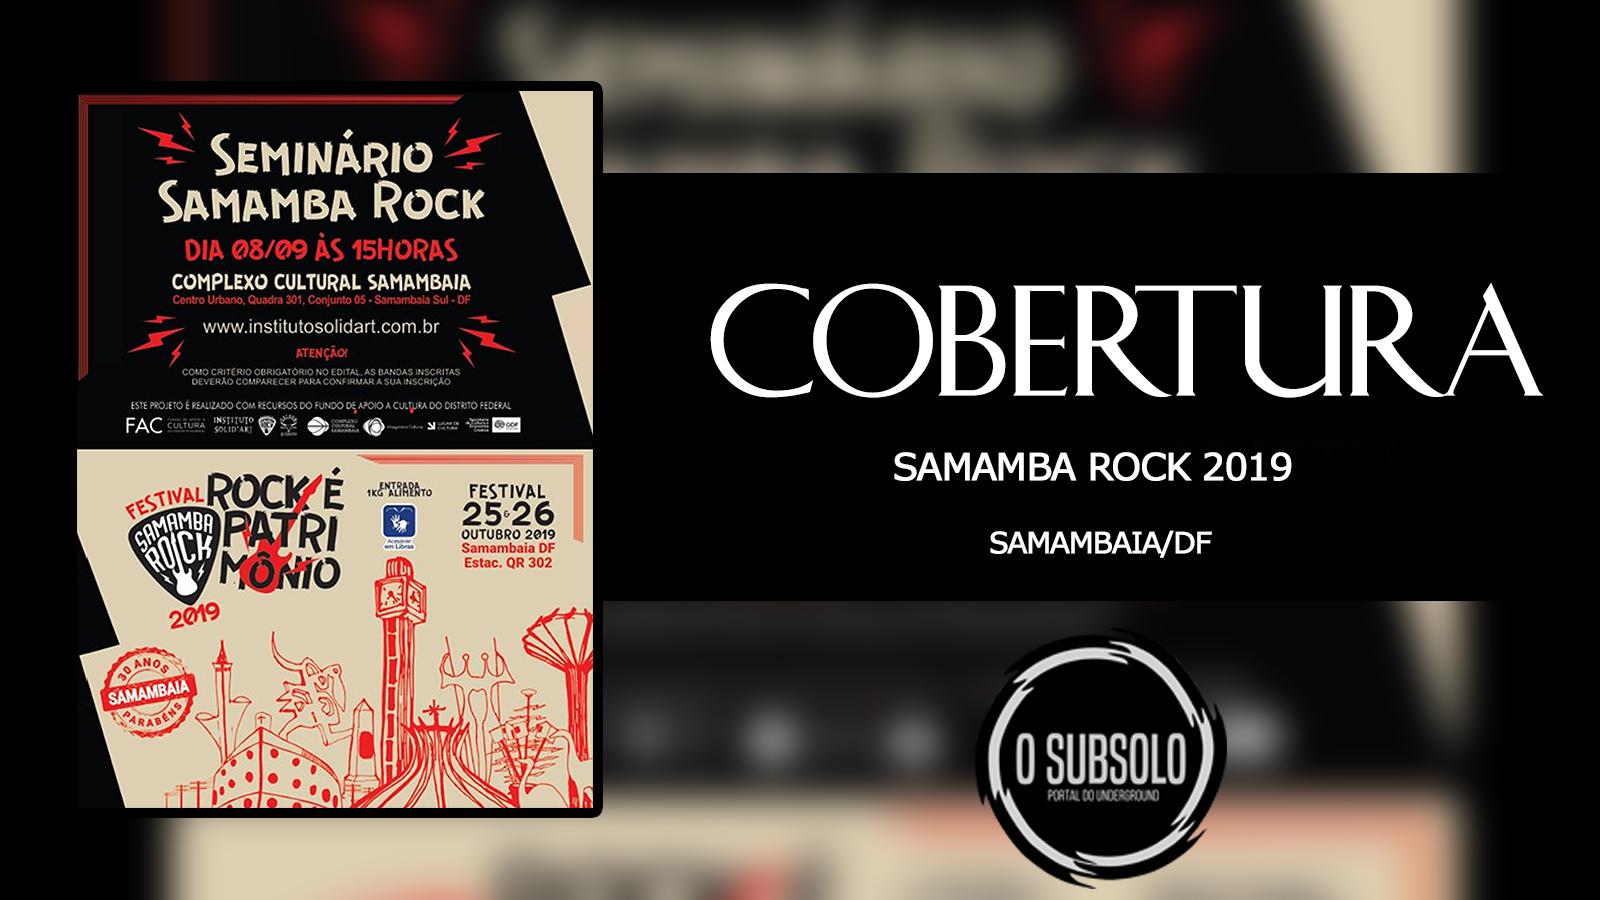 O SUBSOLO | COBERTURA SAMAMBA ROCK 2019